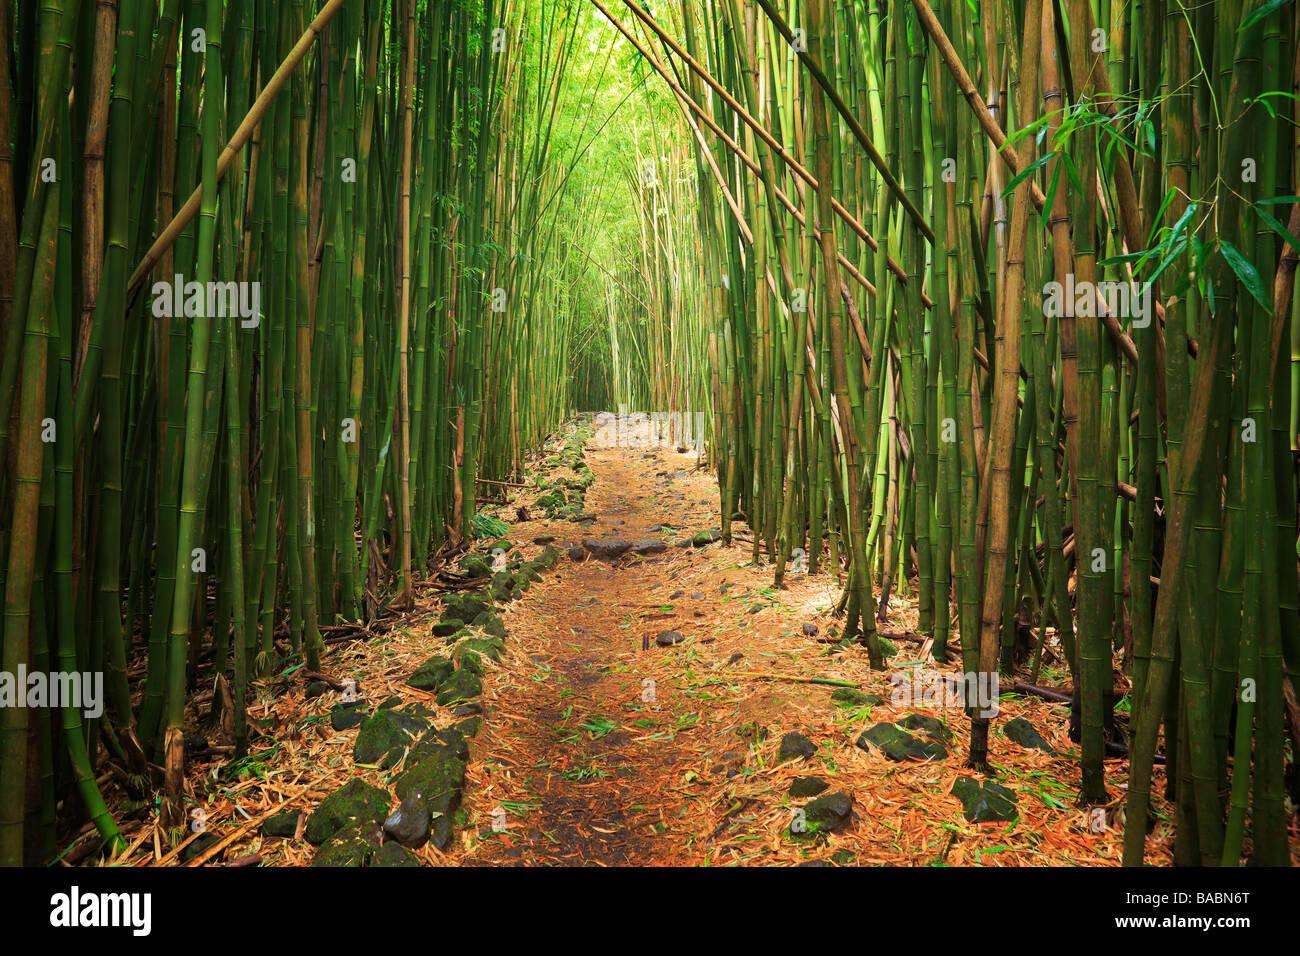 Bamboo forest along the Pipiwai trail to Waimoku Fall in the Kipahulu area of Haleakala National Park in Maui Hawaii Stock Photo